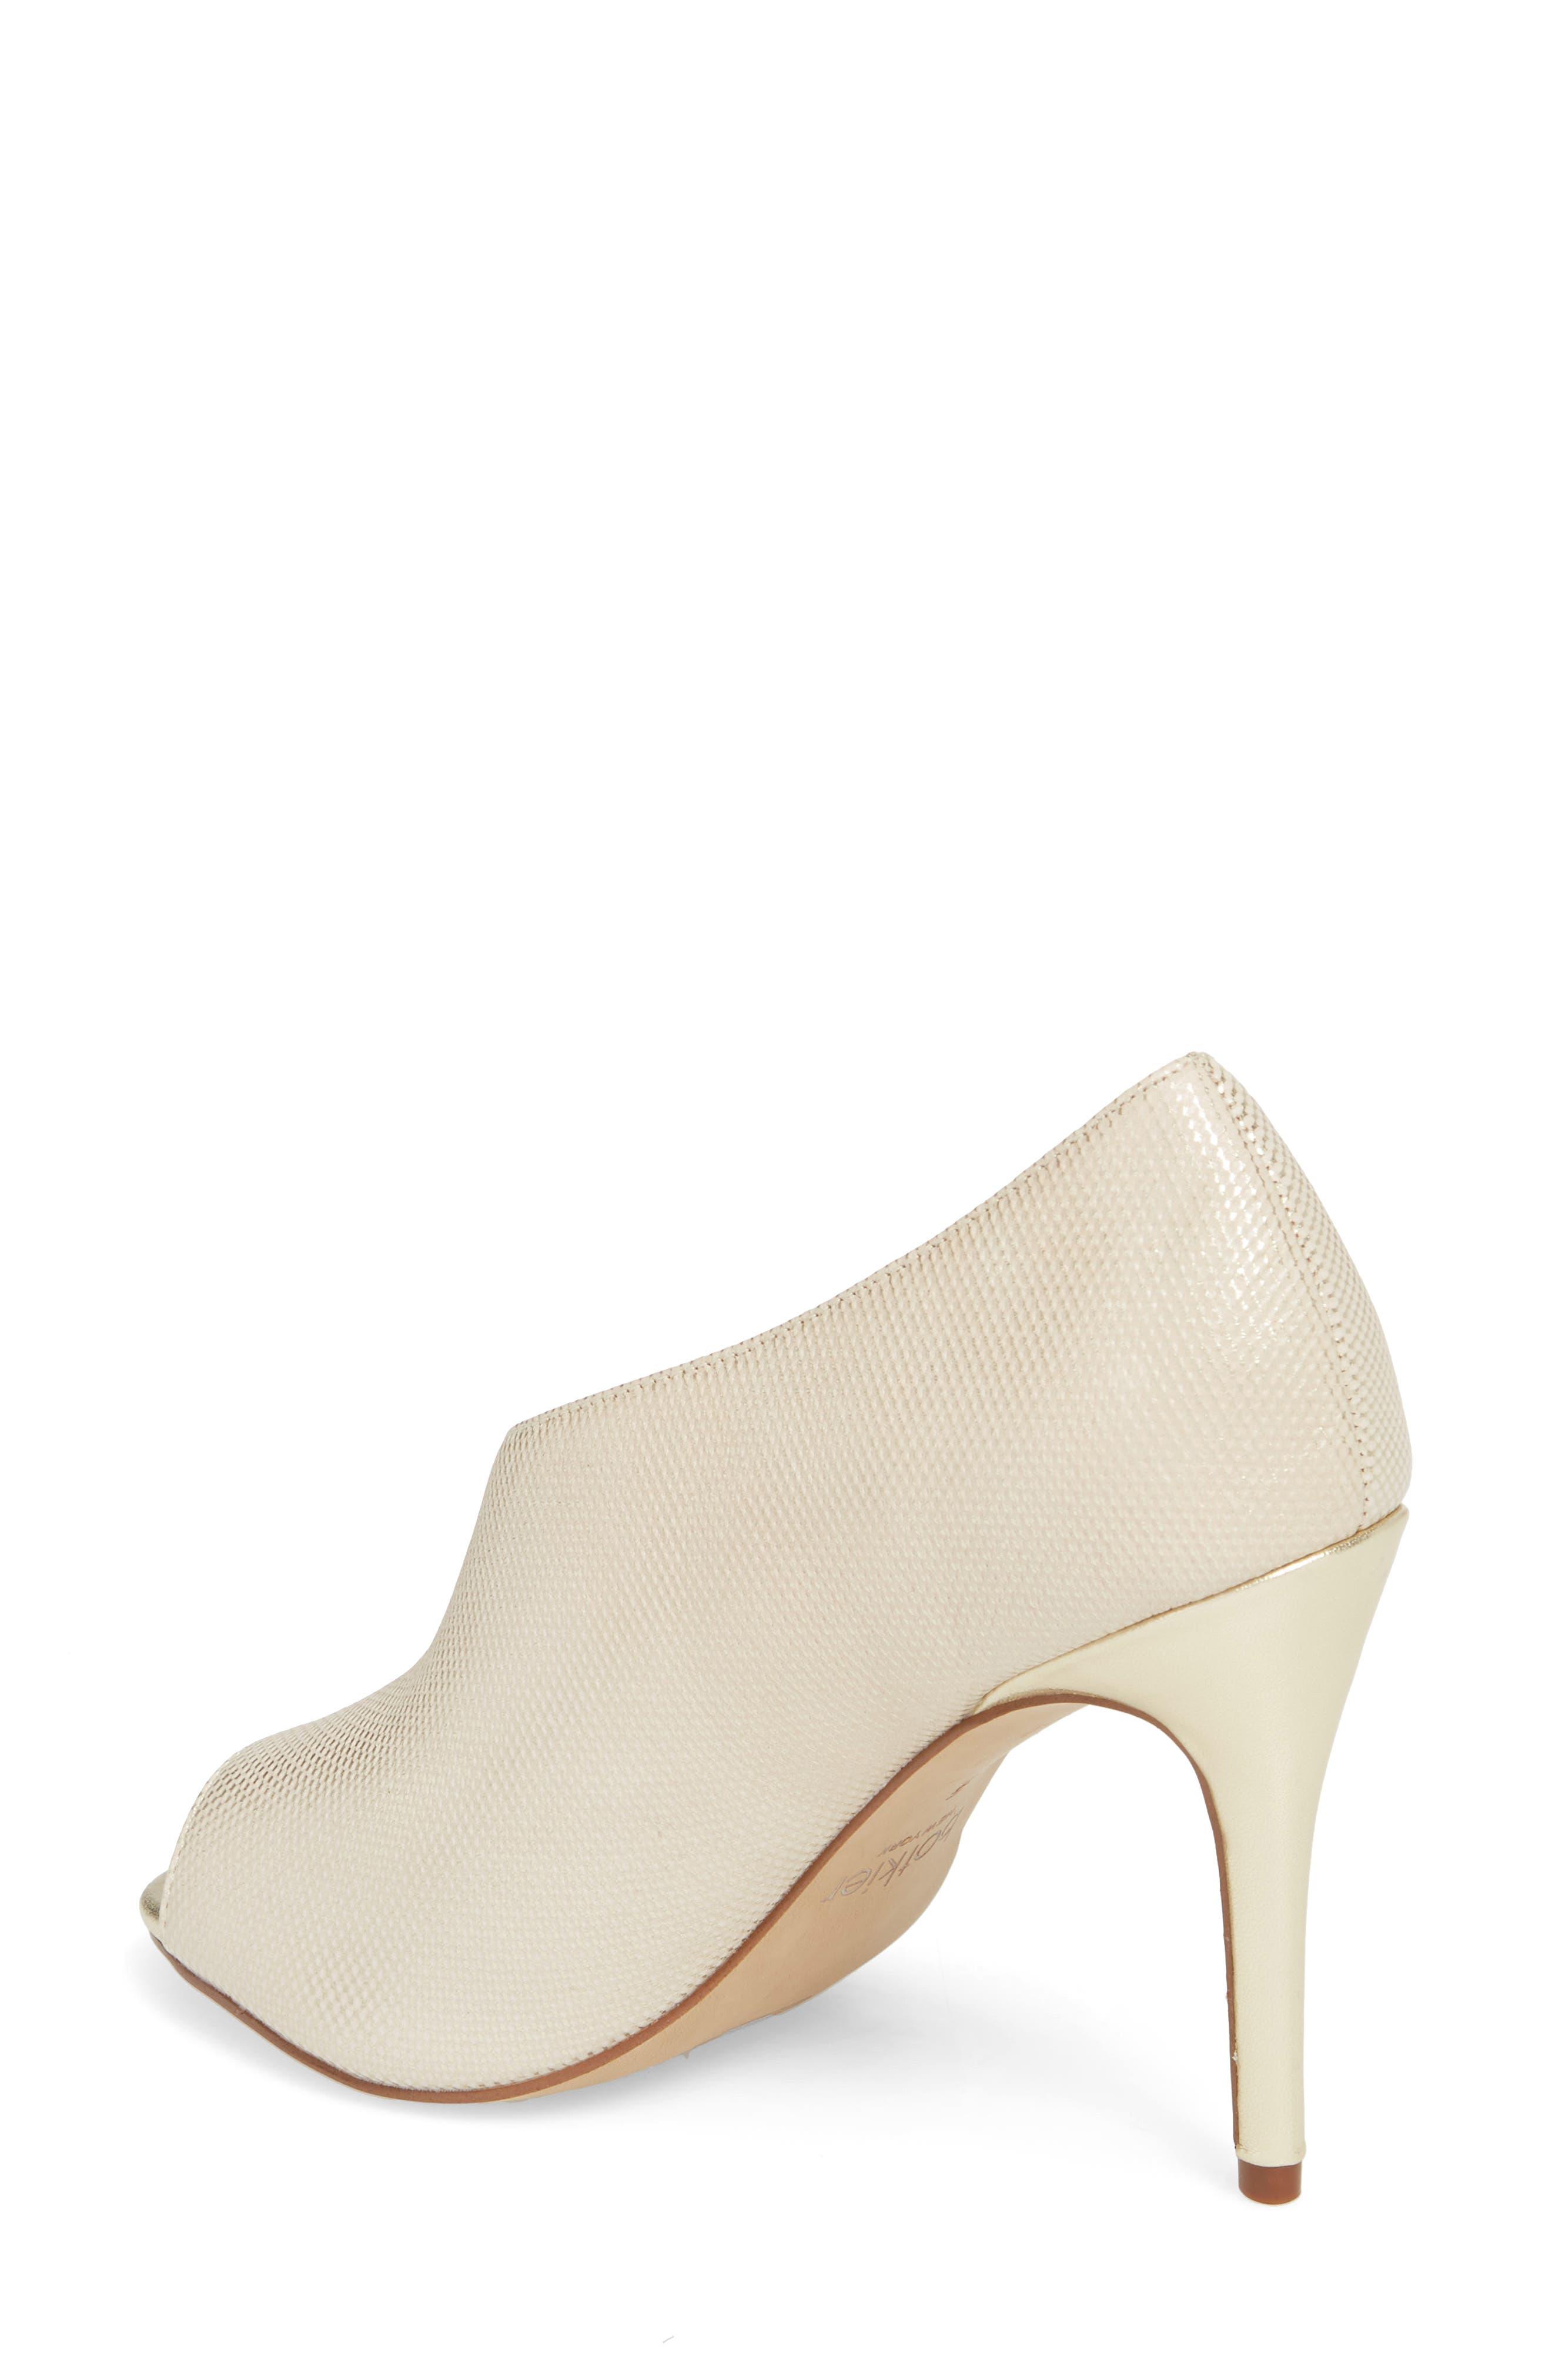 Adelia Asymmetrical Sandal,                             Alternate thumbnail 2, color,                             Gold Shimmer Fabric